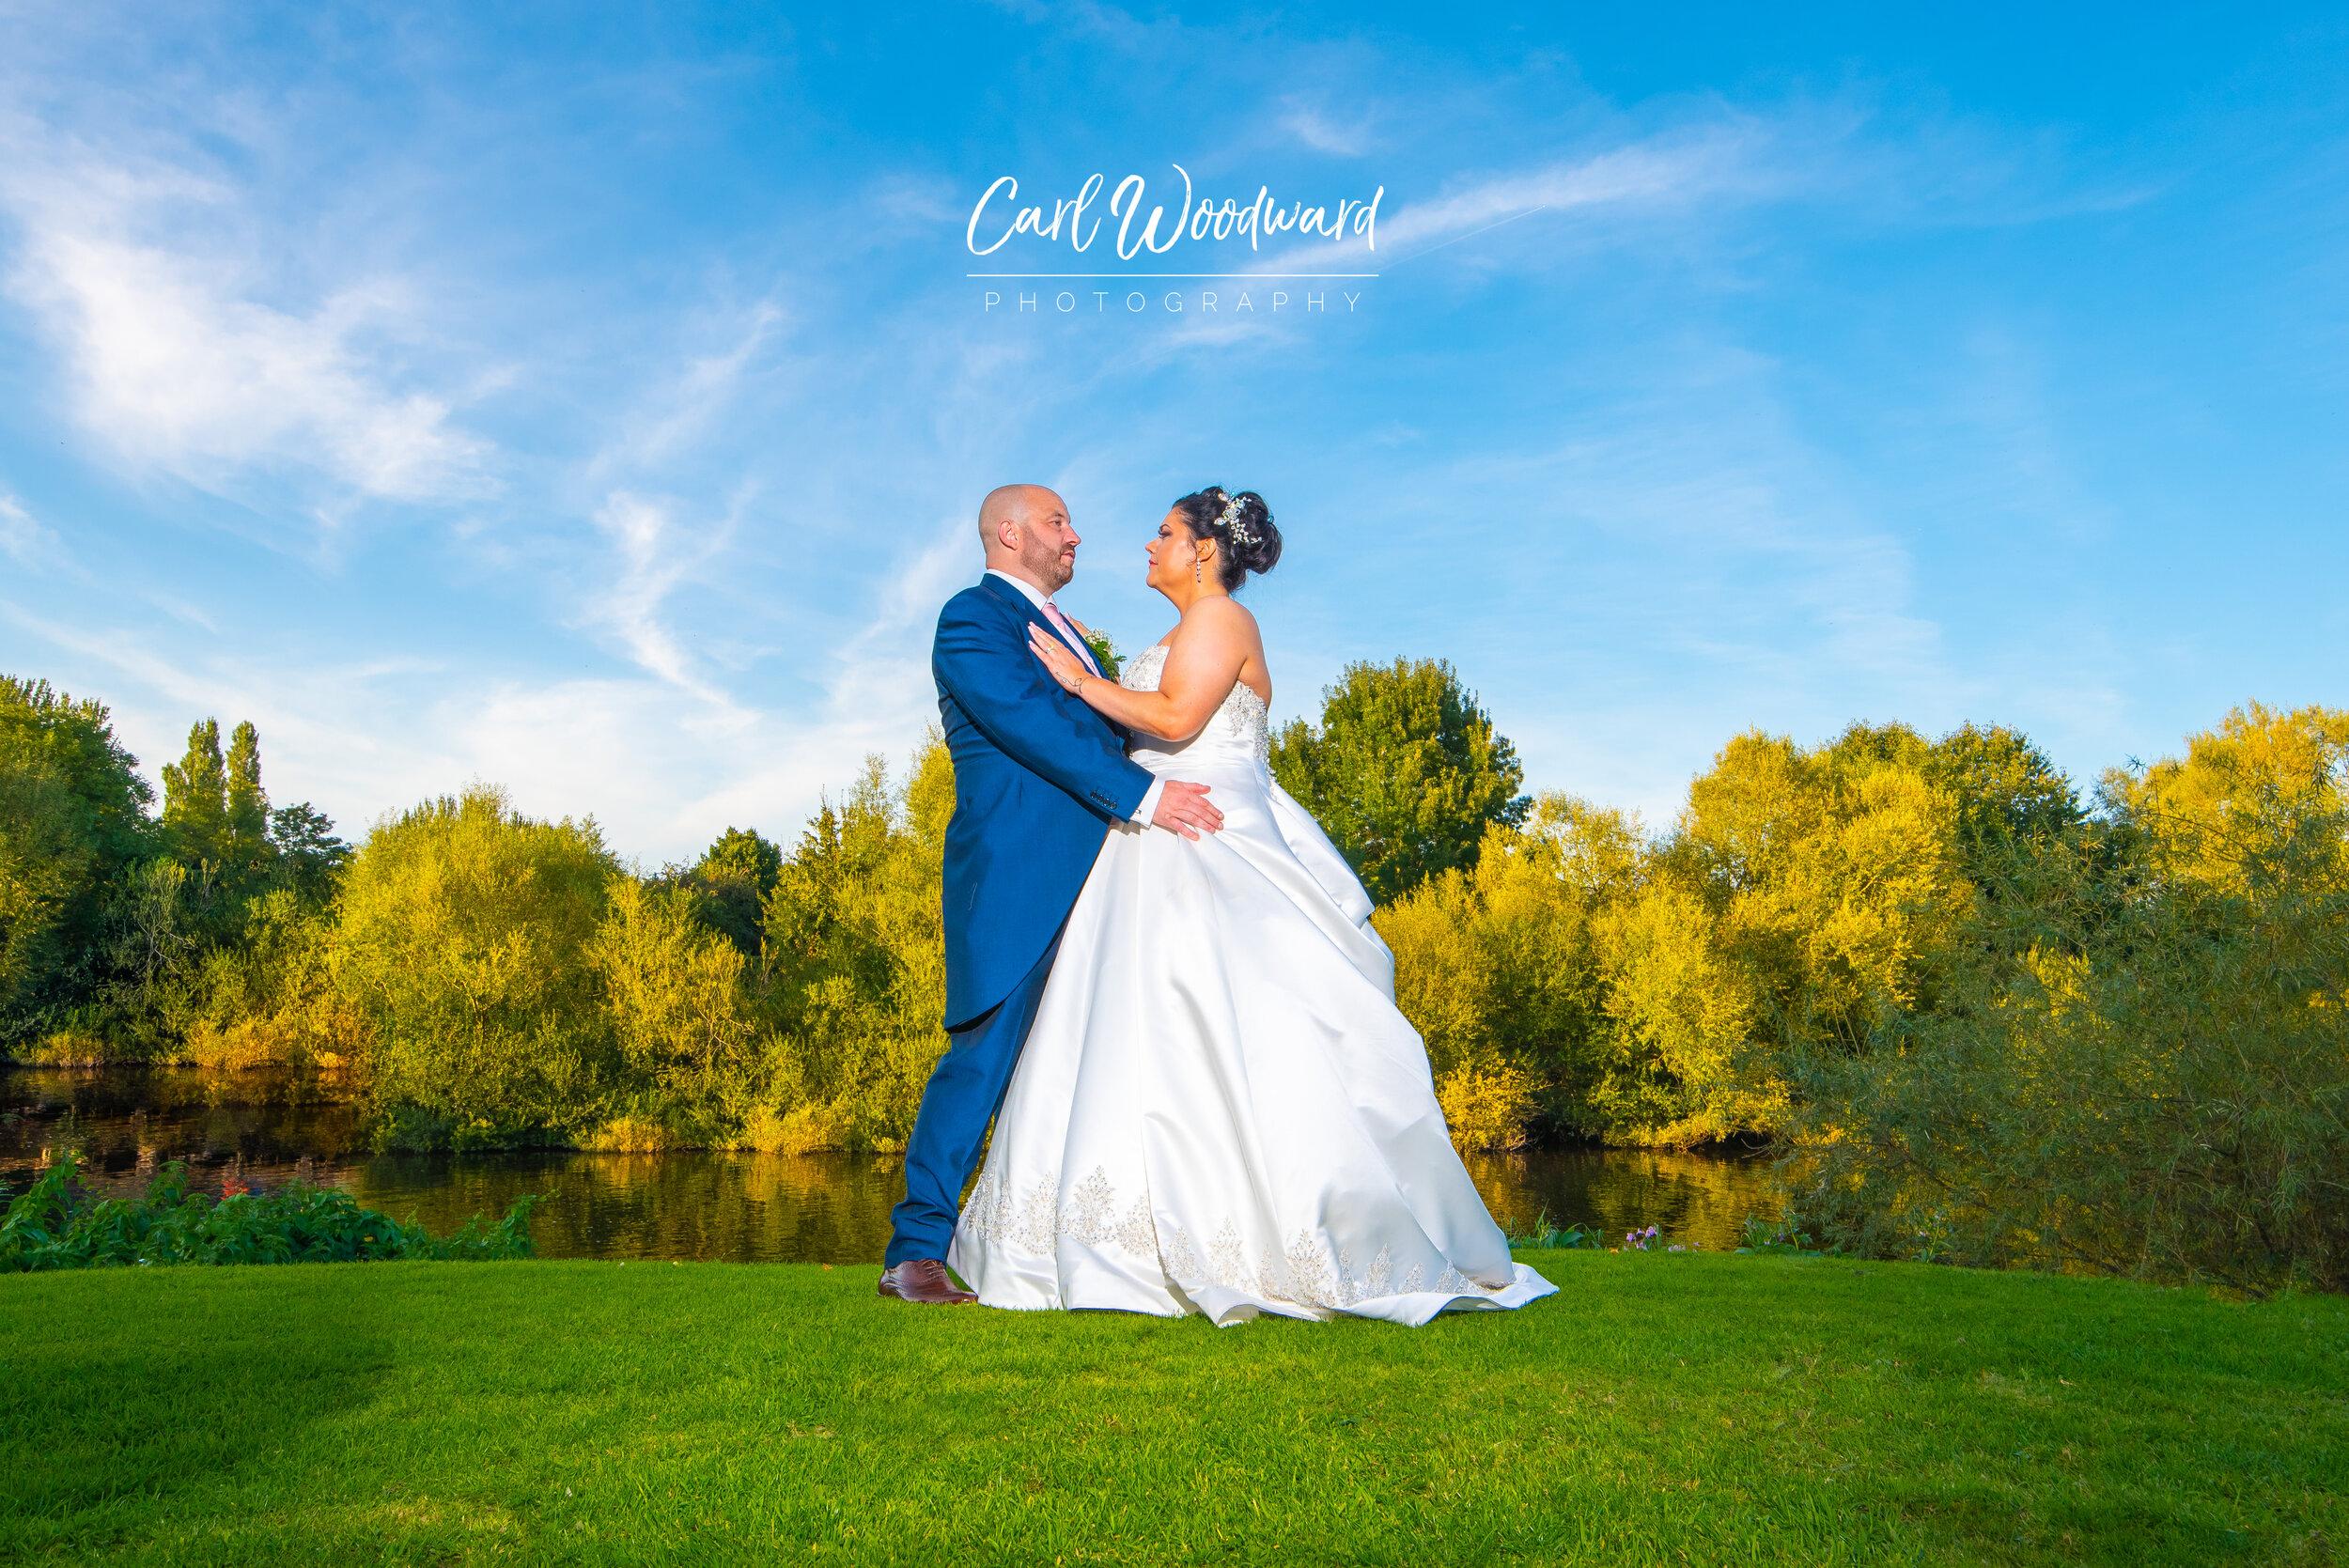 015-The-Holt-Fleet-Wedding-Photos.jpg